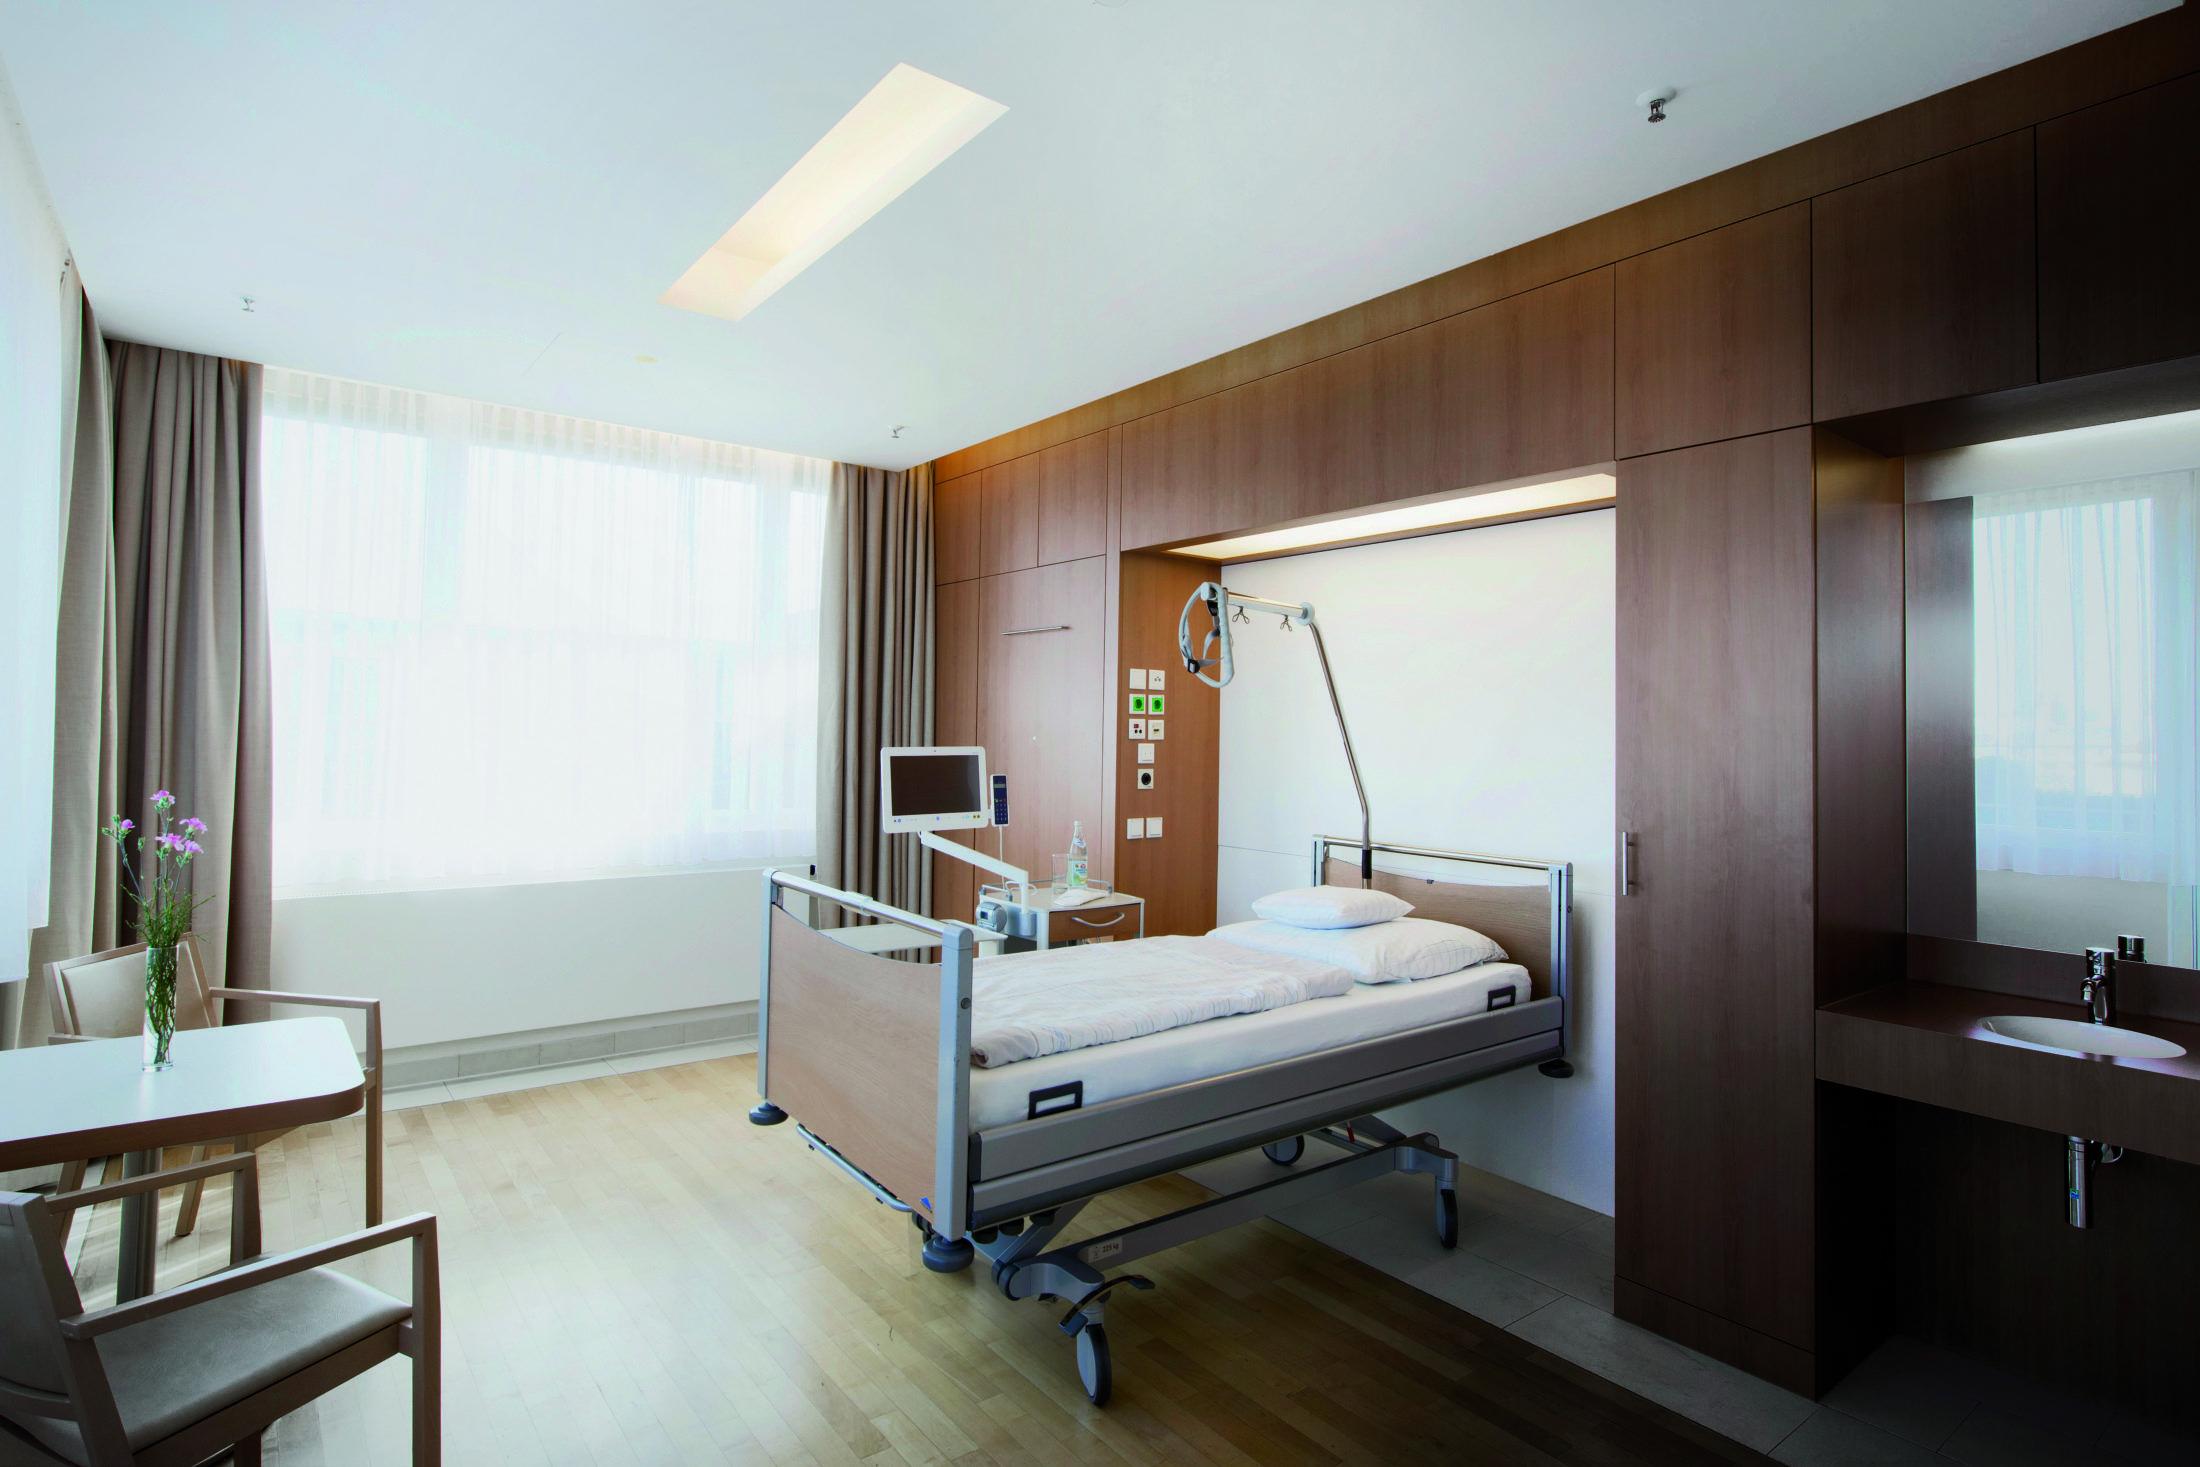 rgp architekten, Klinik, Patientenzimmer, Privatklinik